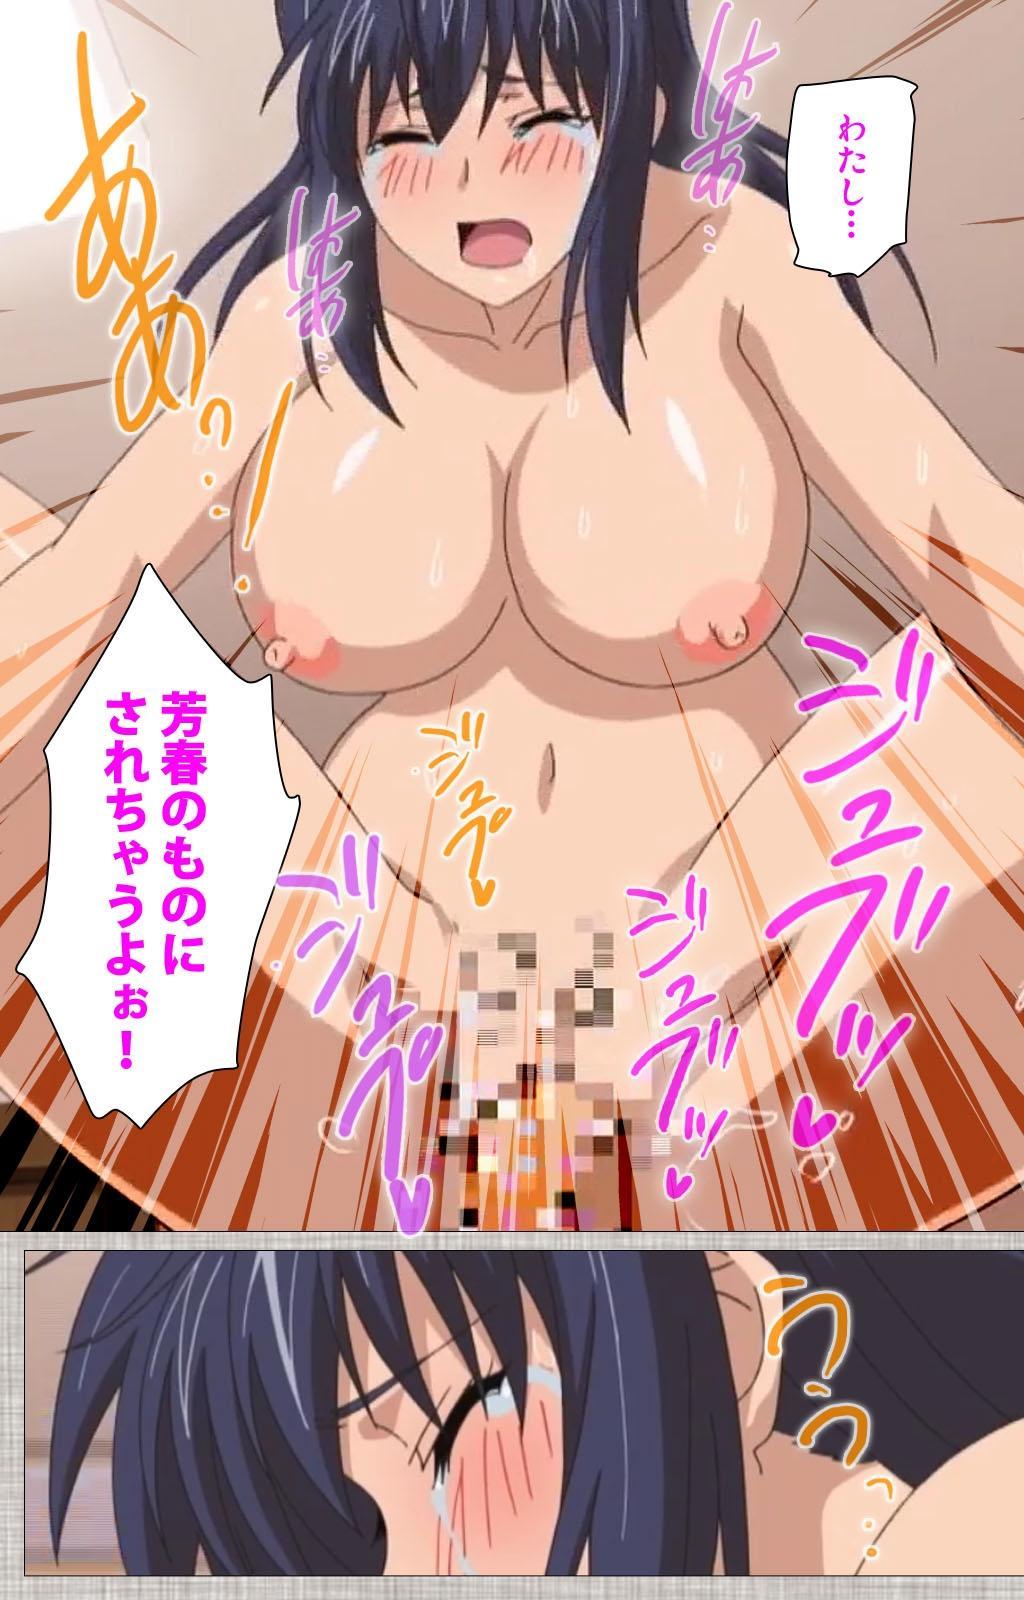 Ane-Koi #1 Complete Ban 110